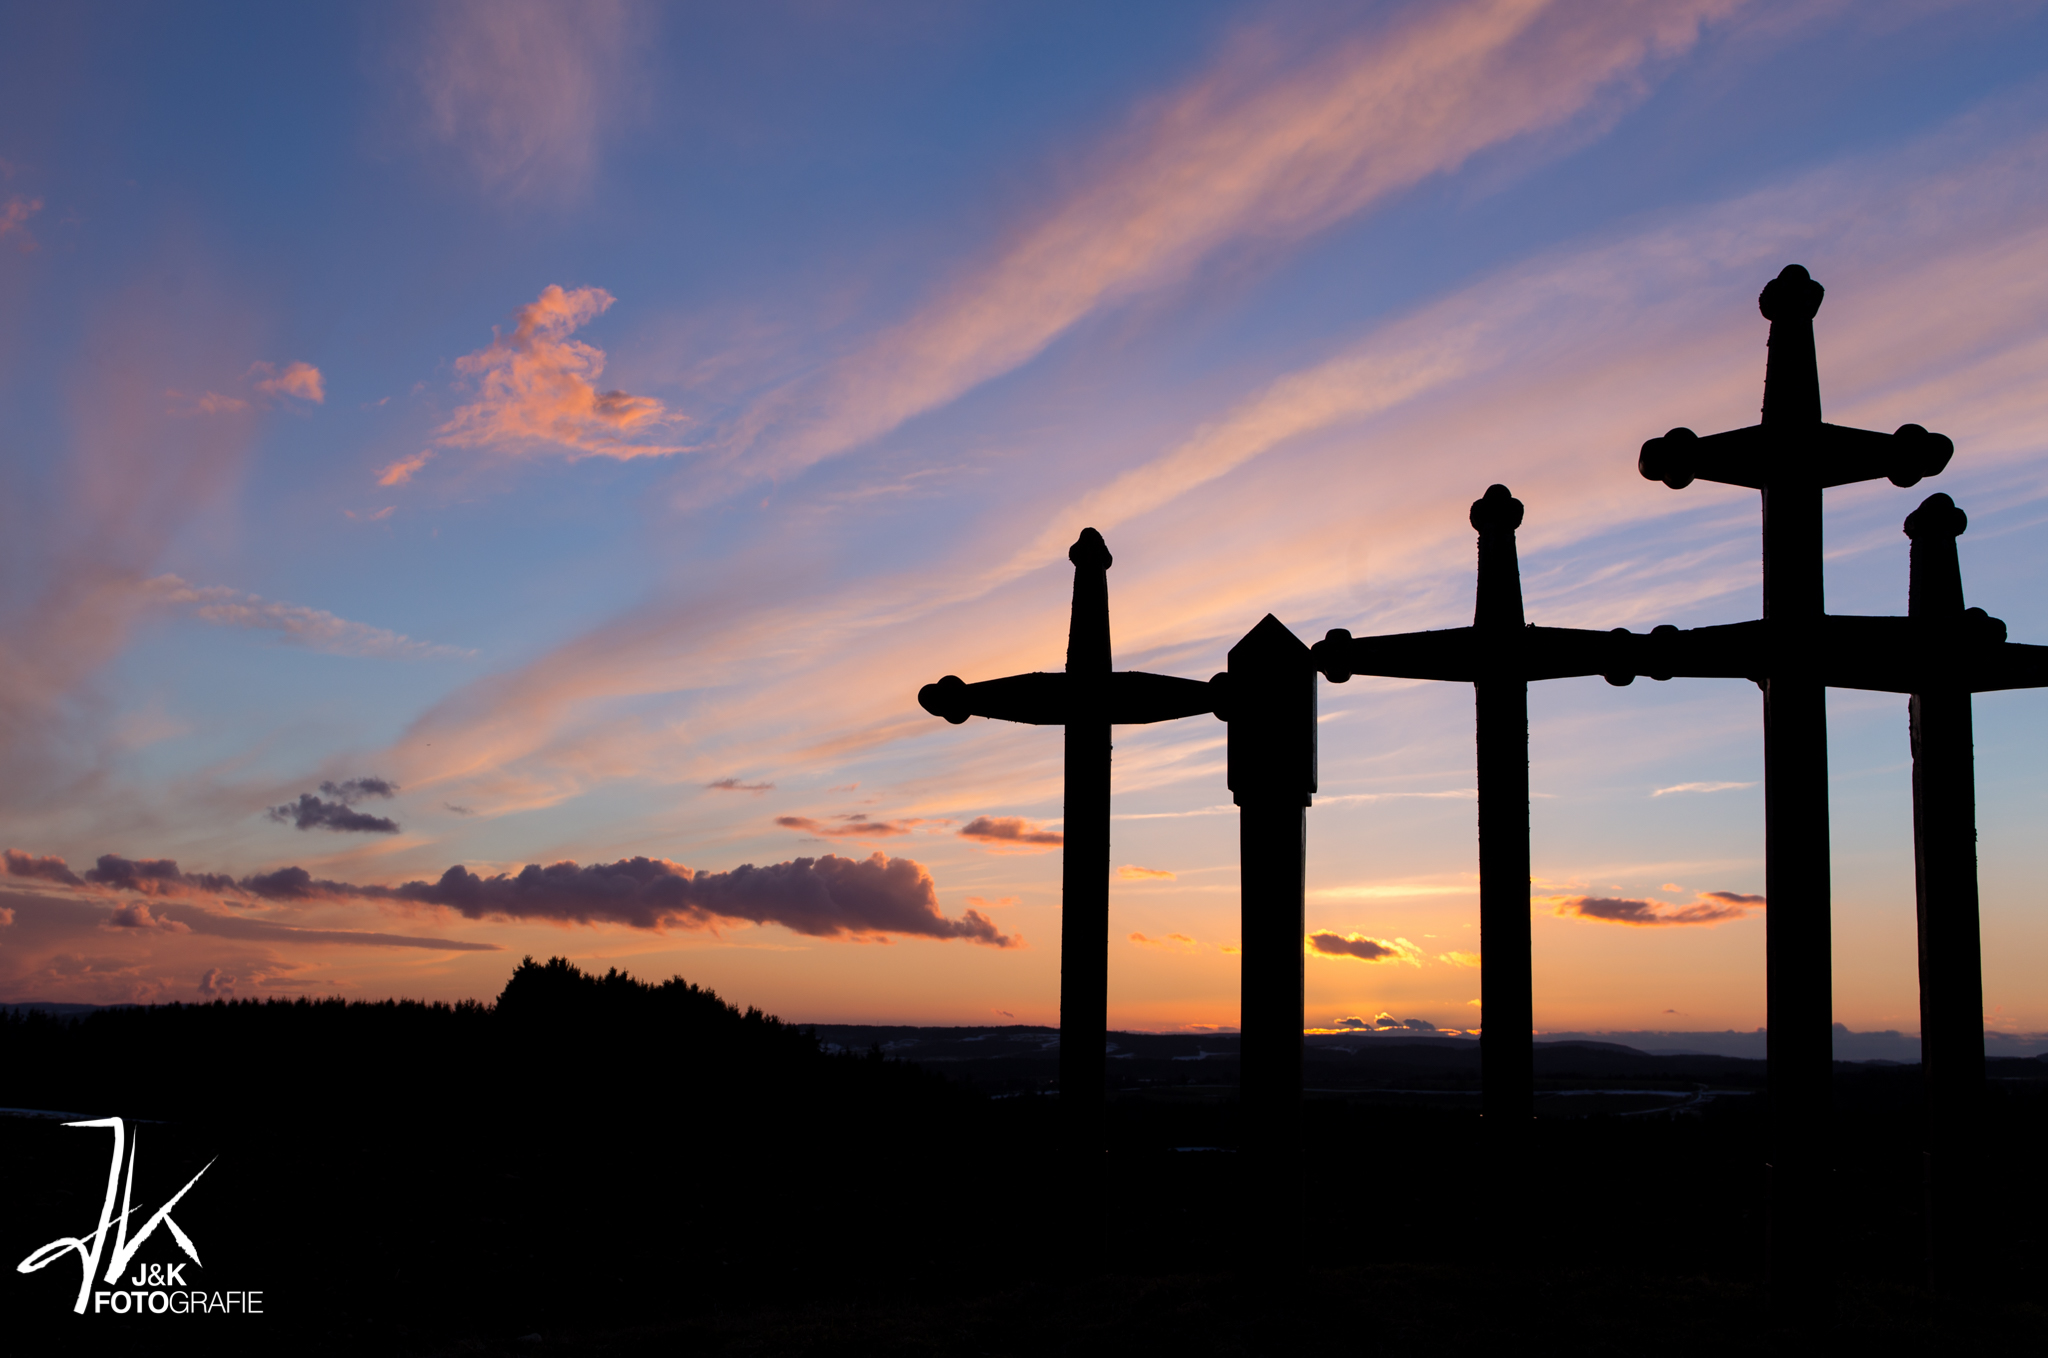 Plague crosses, Germany